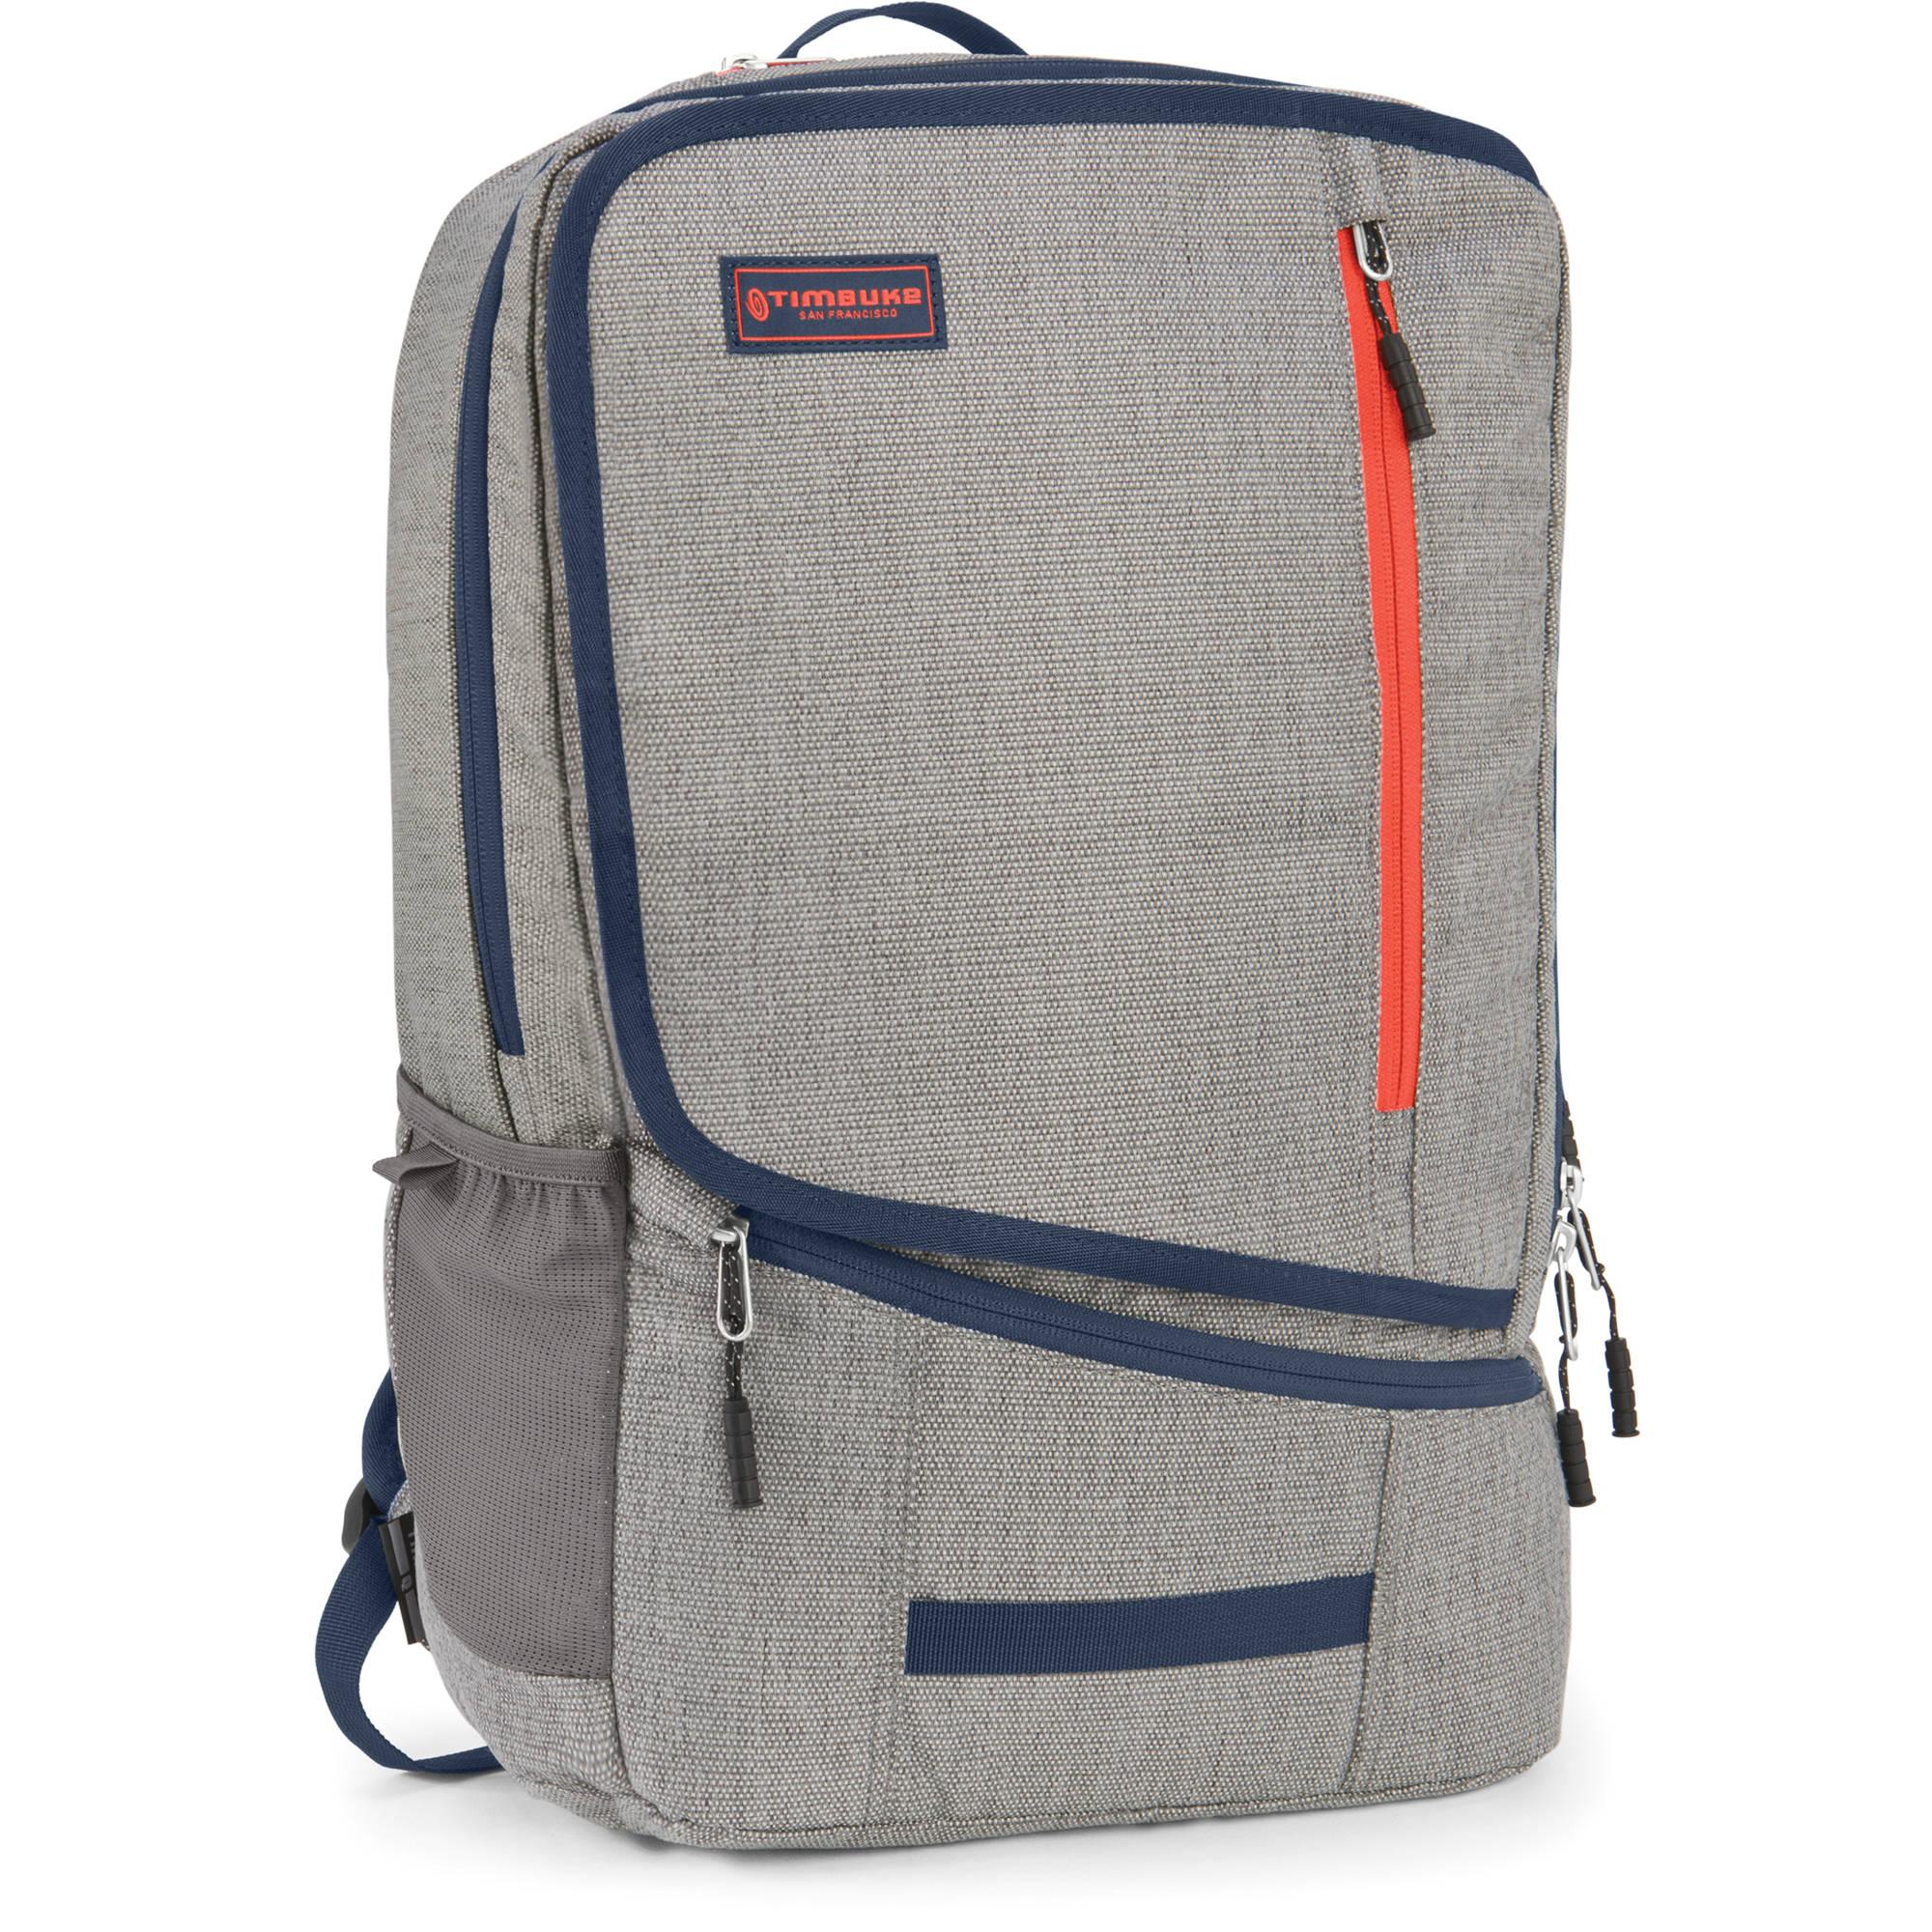 f697d6b88e2 Timbuk2 Q Laptop Backpack 2014 (Grey Solstice) 396-3-1255 B H